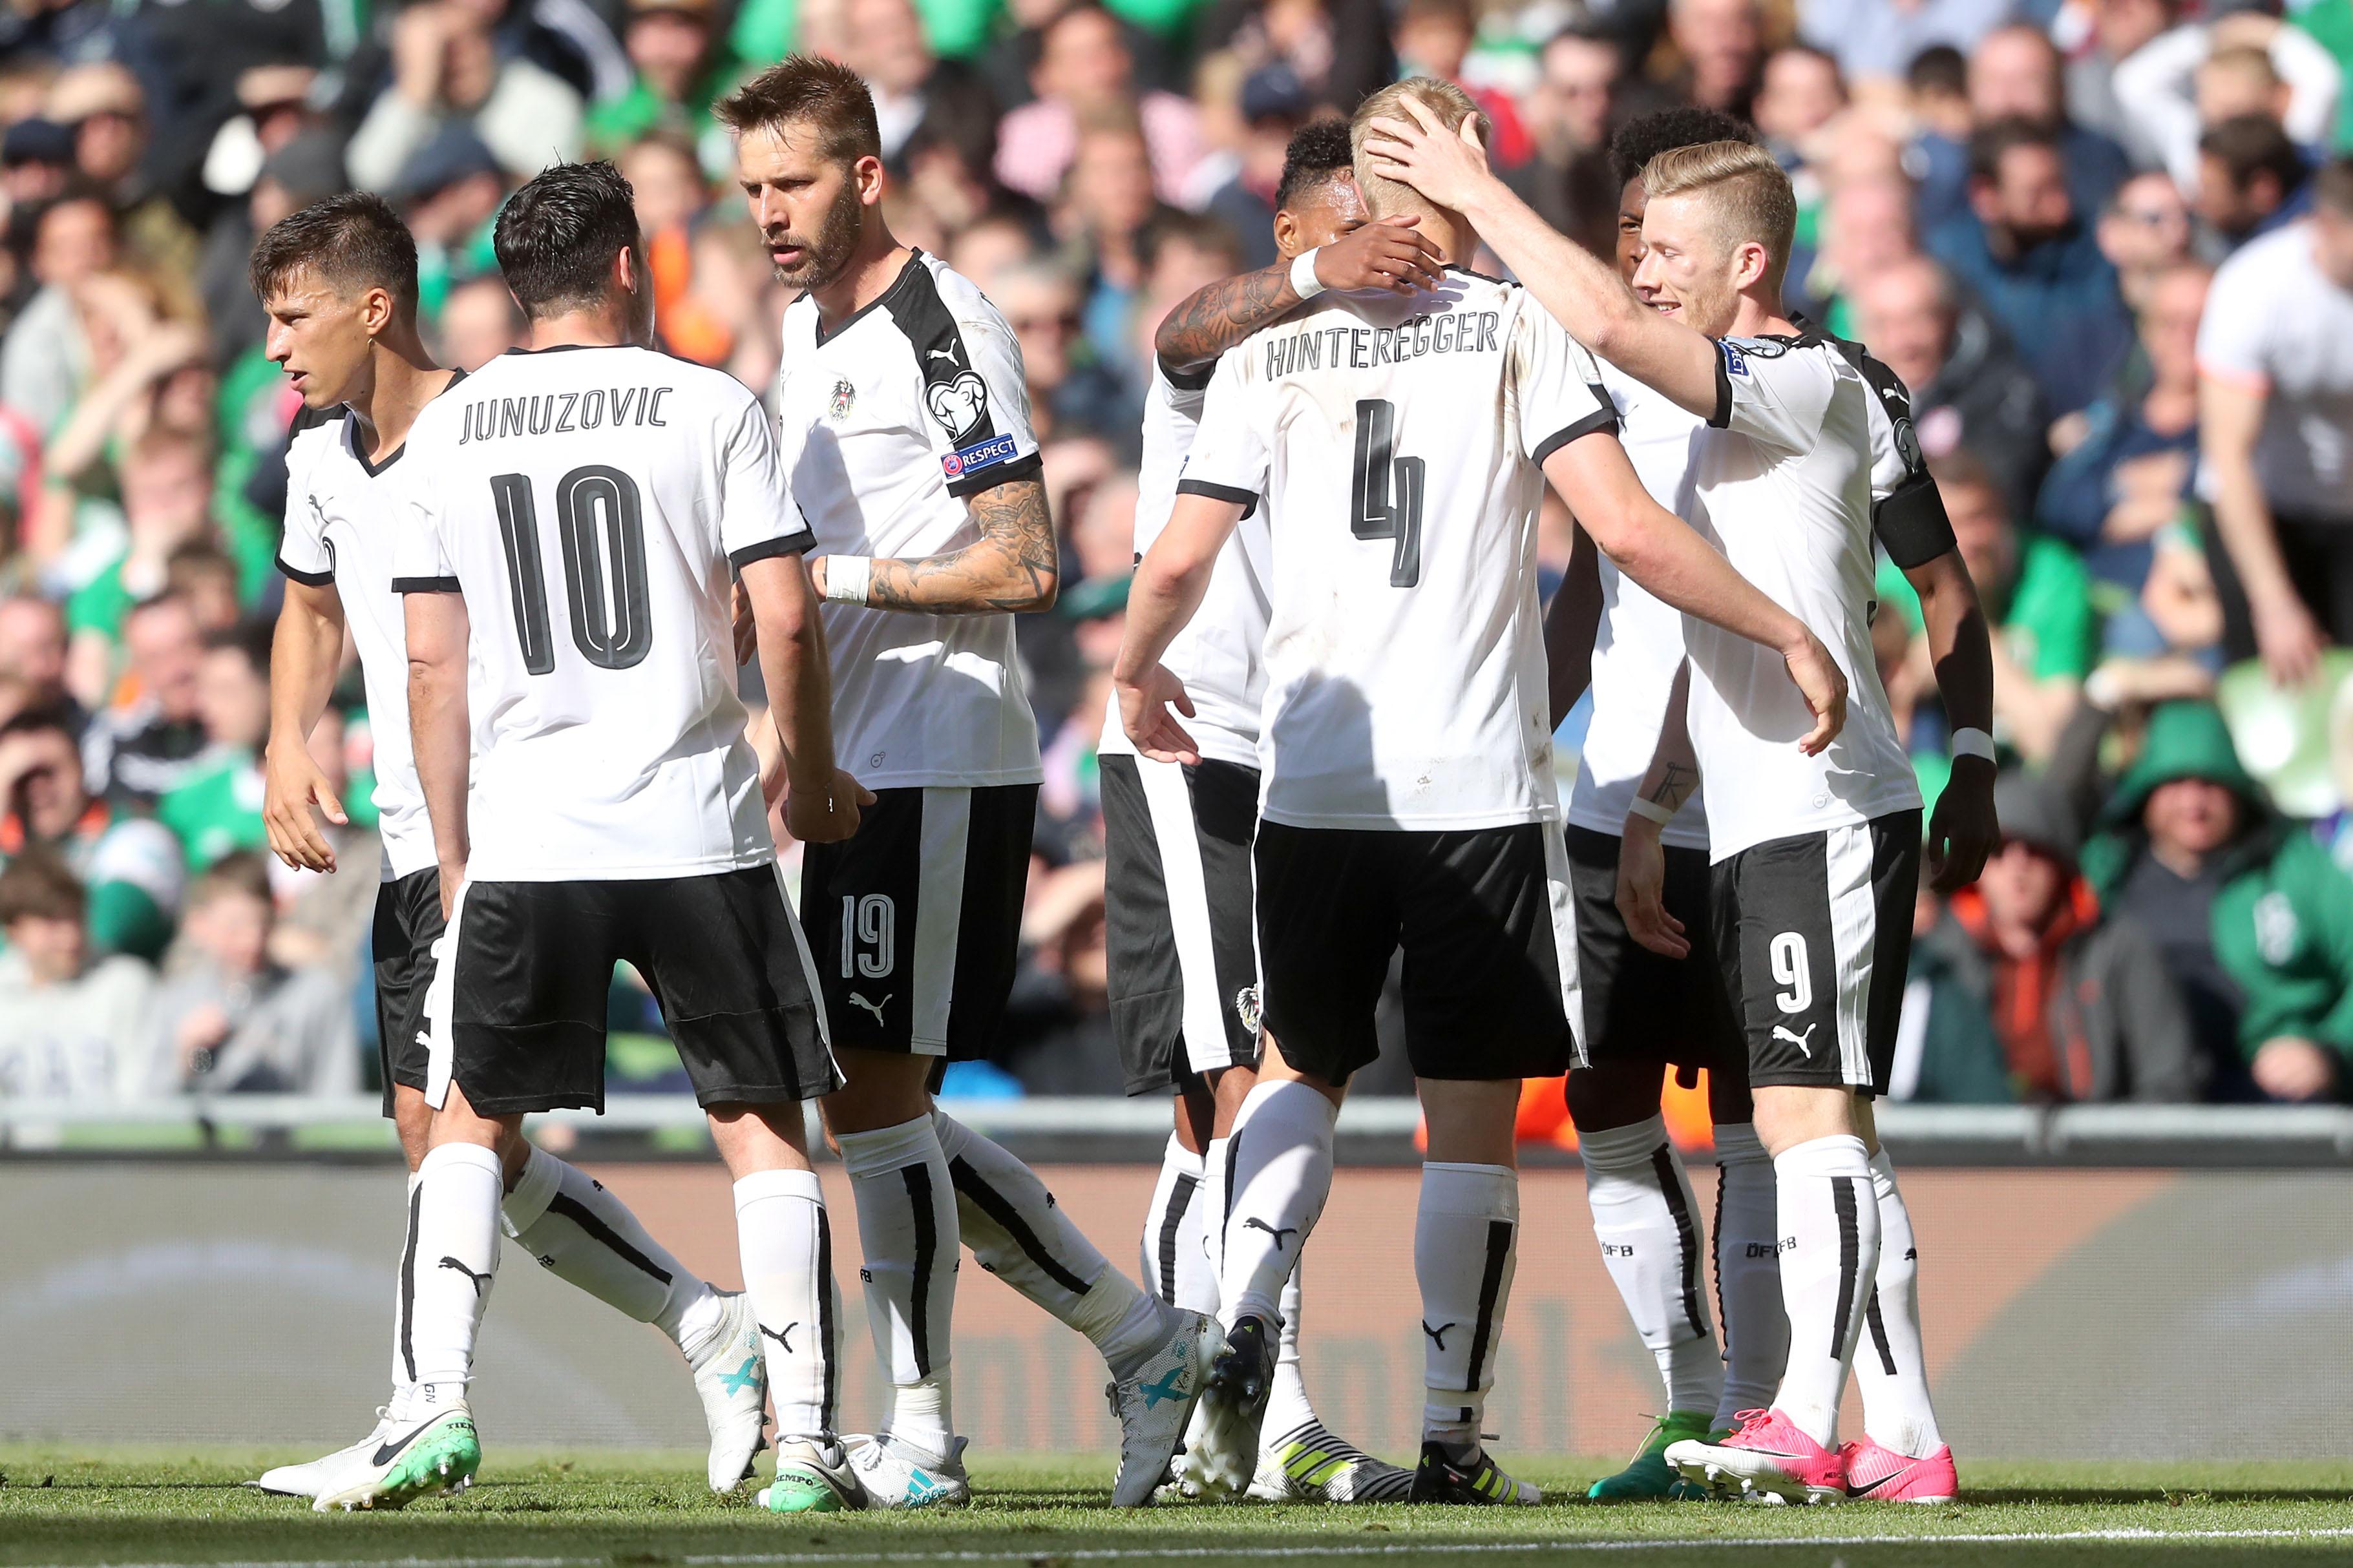 Republic Of Ireland V Austria 2018 Fifa World Cup Qualifying Group D Aviva Stadium